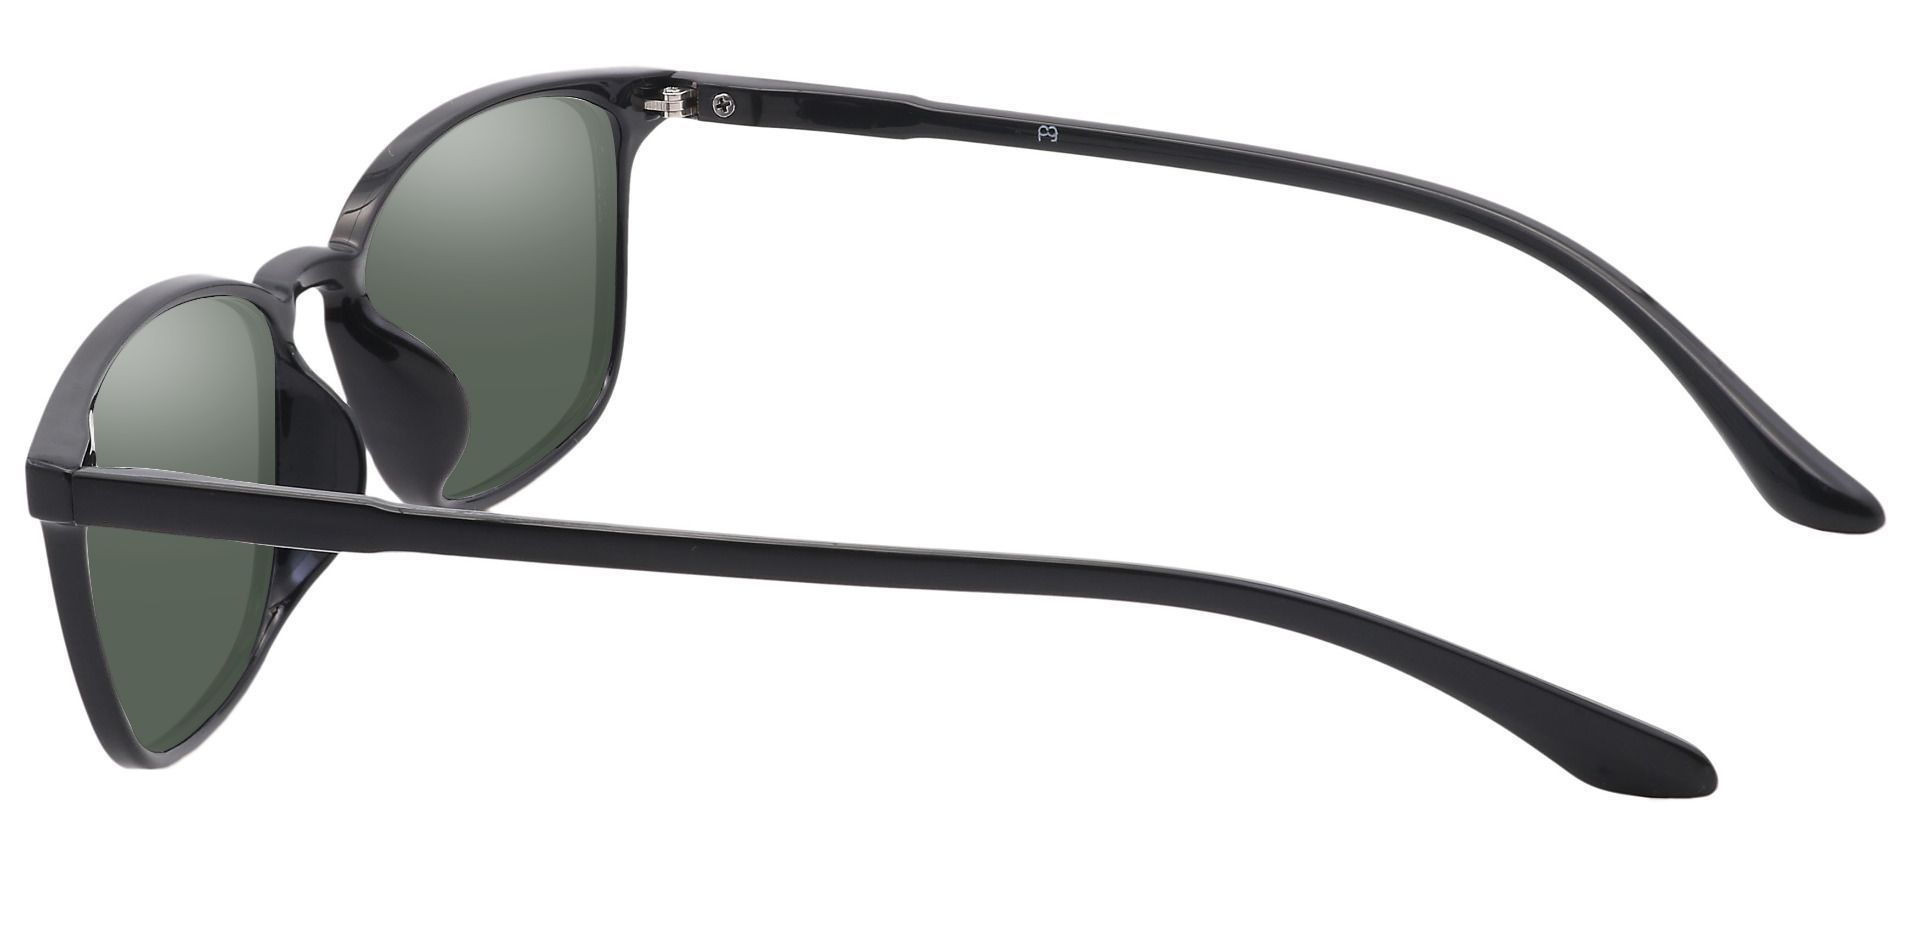 Cabo Oval Prescription Sunglasses - Black Frame With Green Lenses